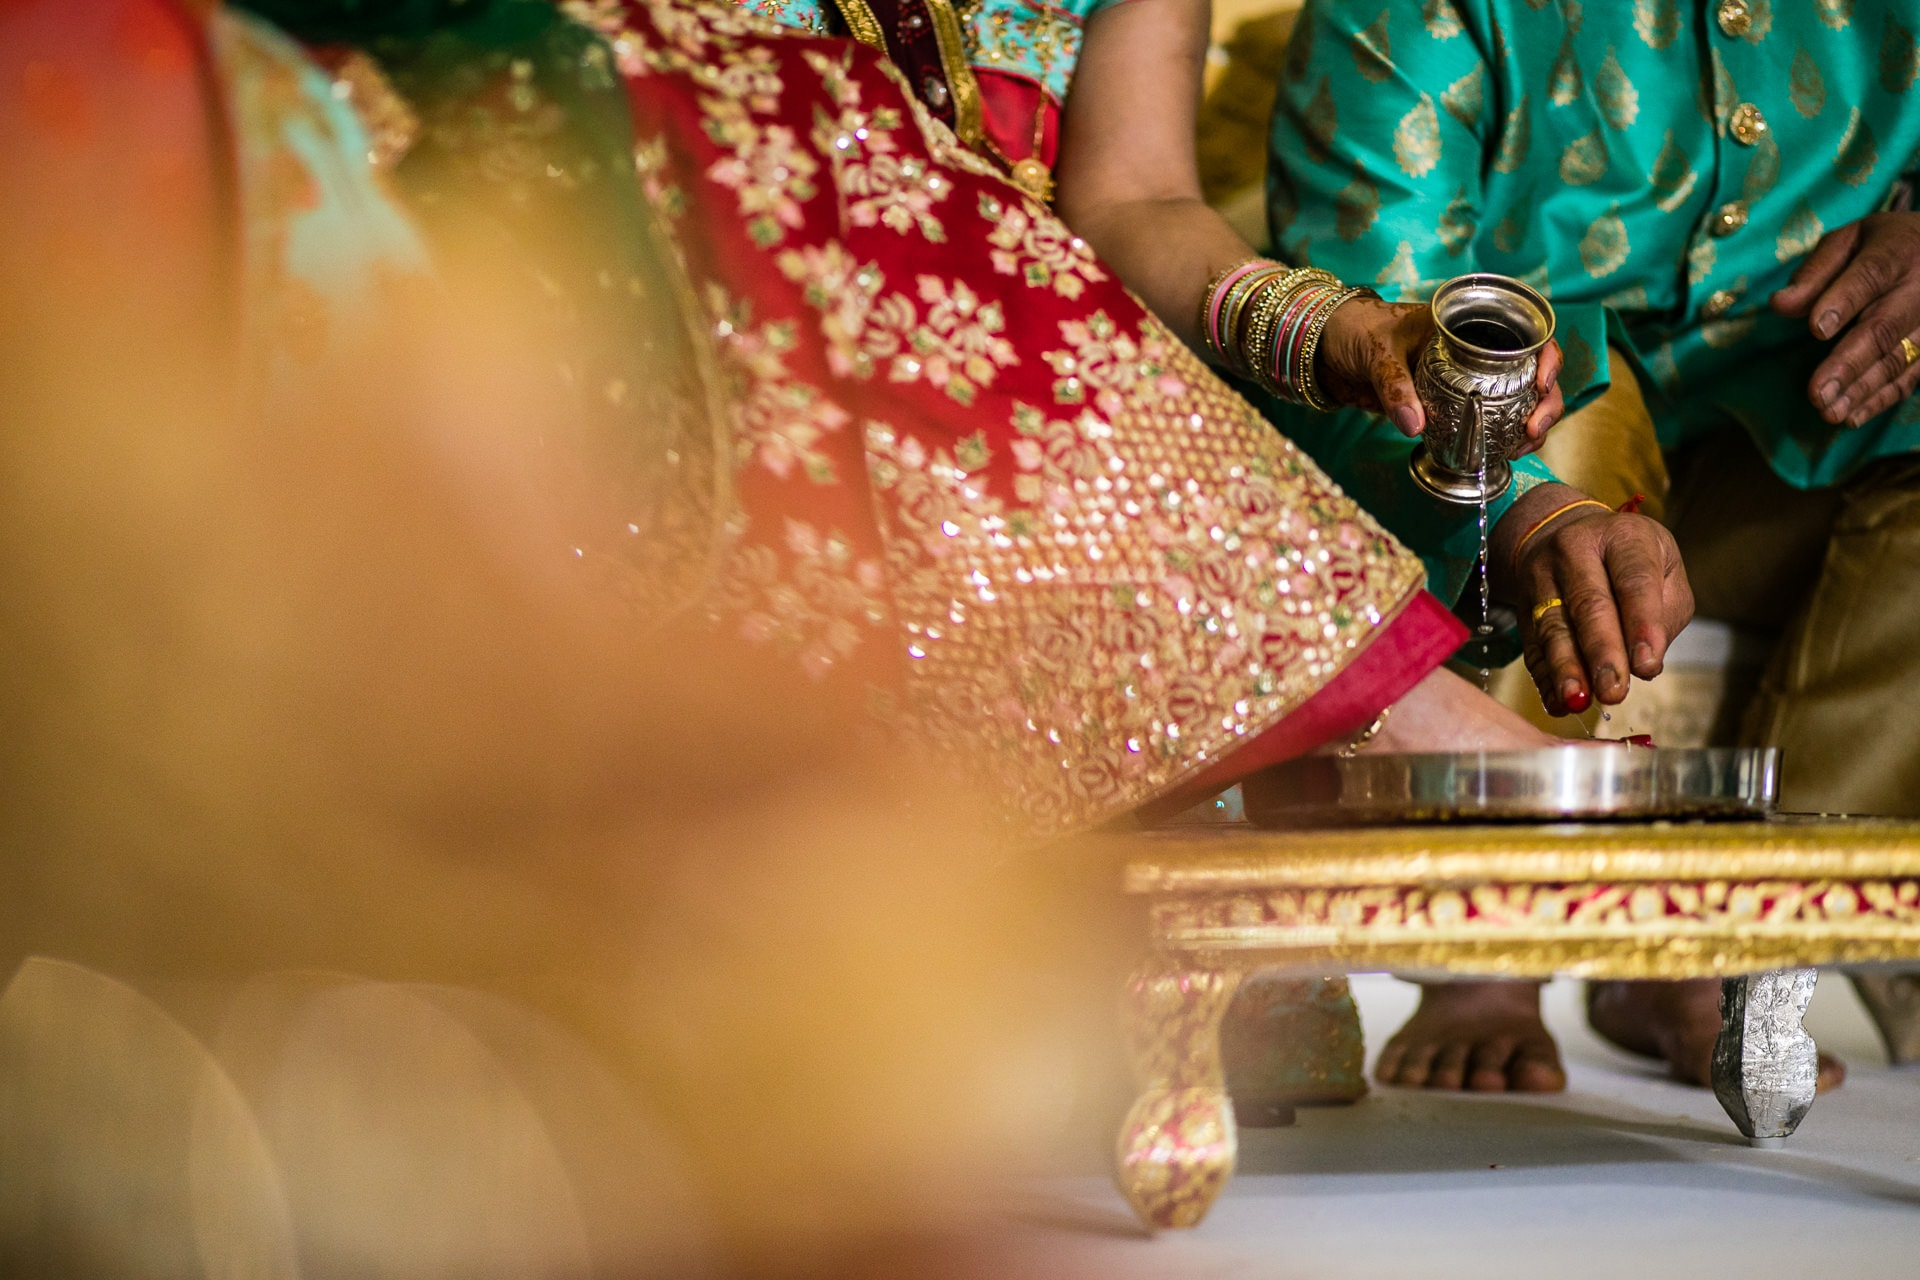 Feet washing ceremony during hindu wedding